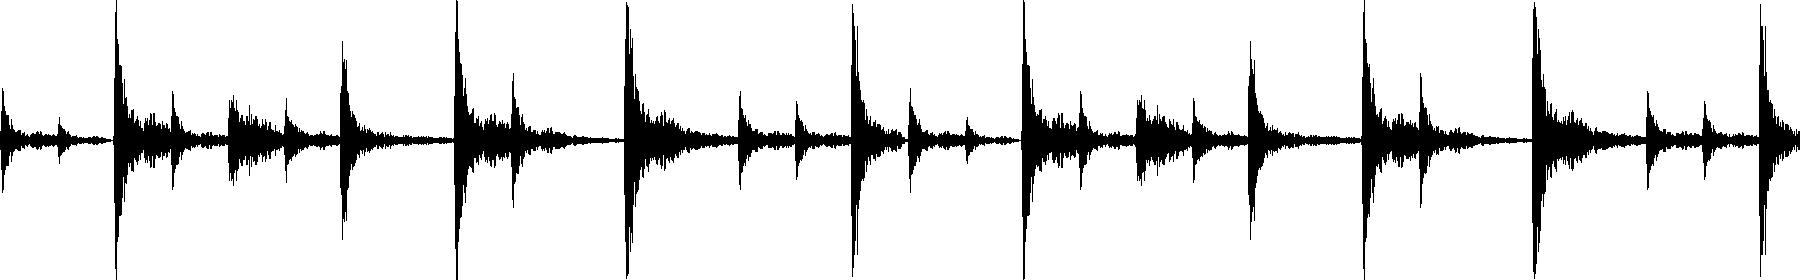 bluezone bc0210 percussion loop 023 110